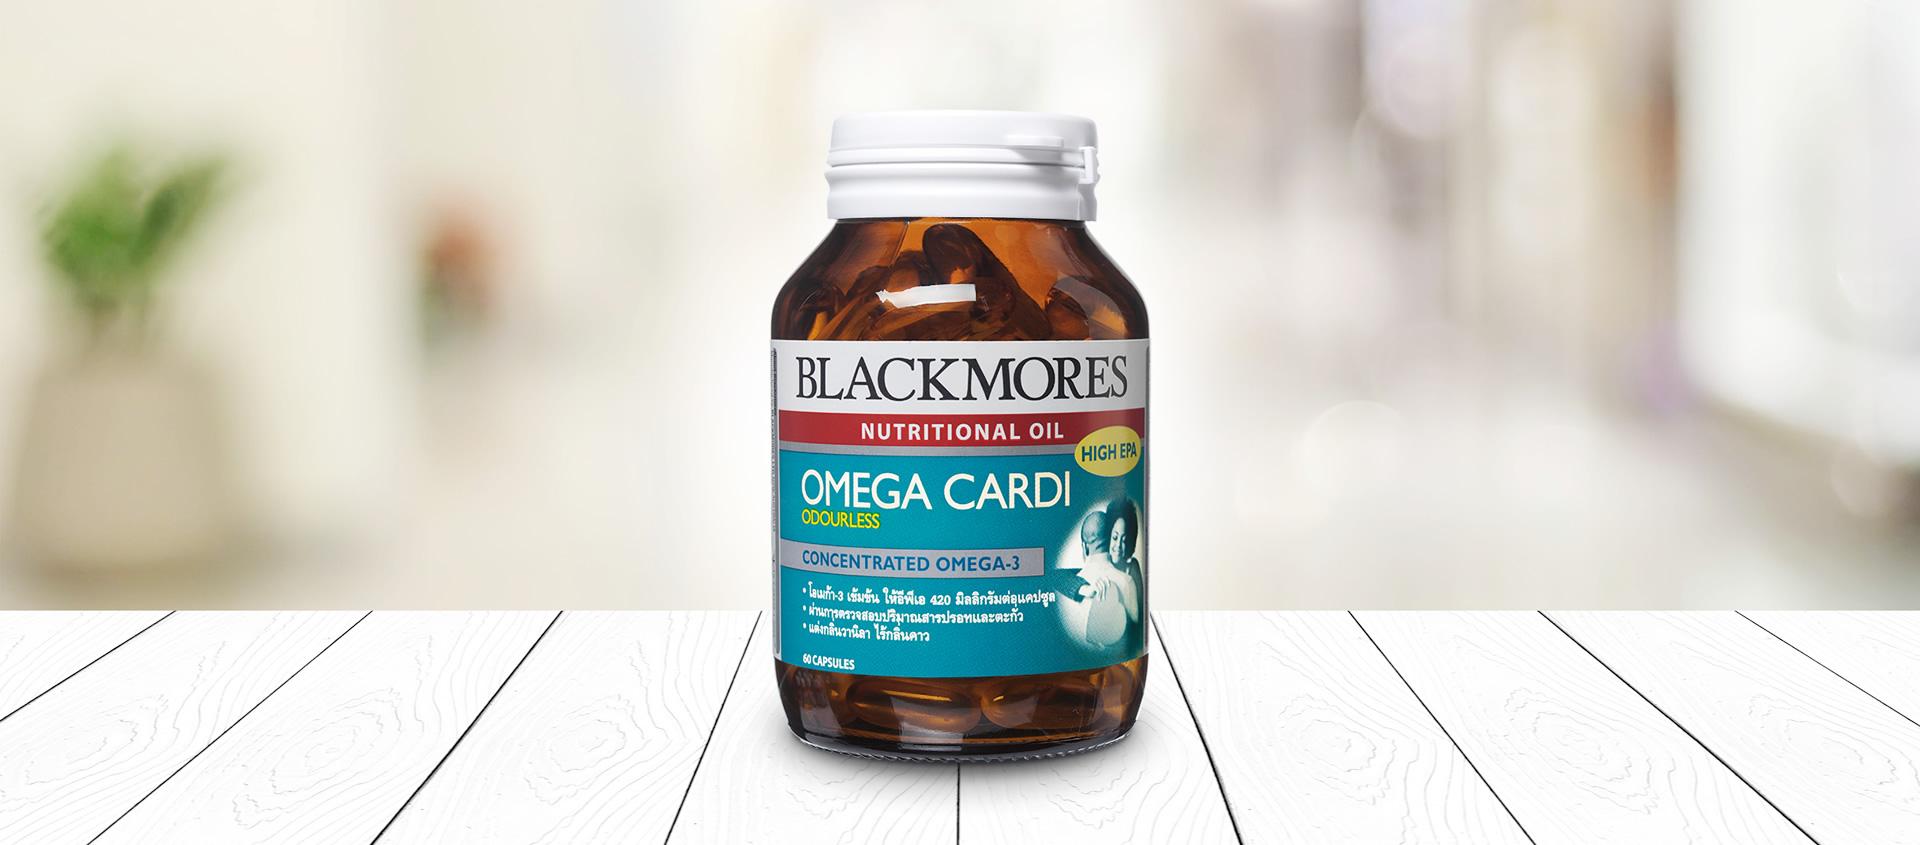 Blackmore Omega cardi 60s